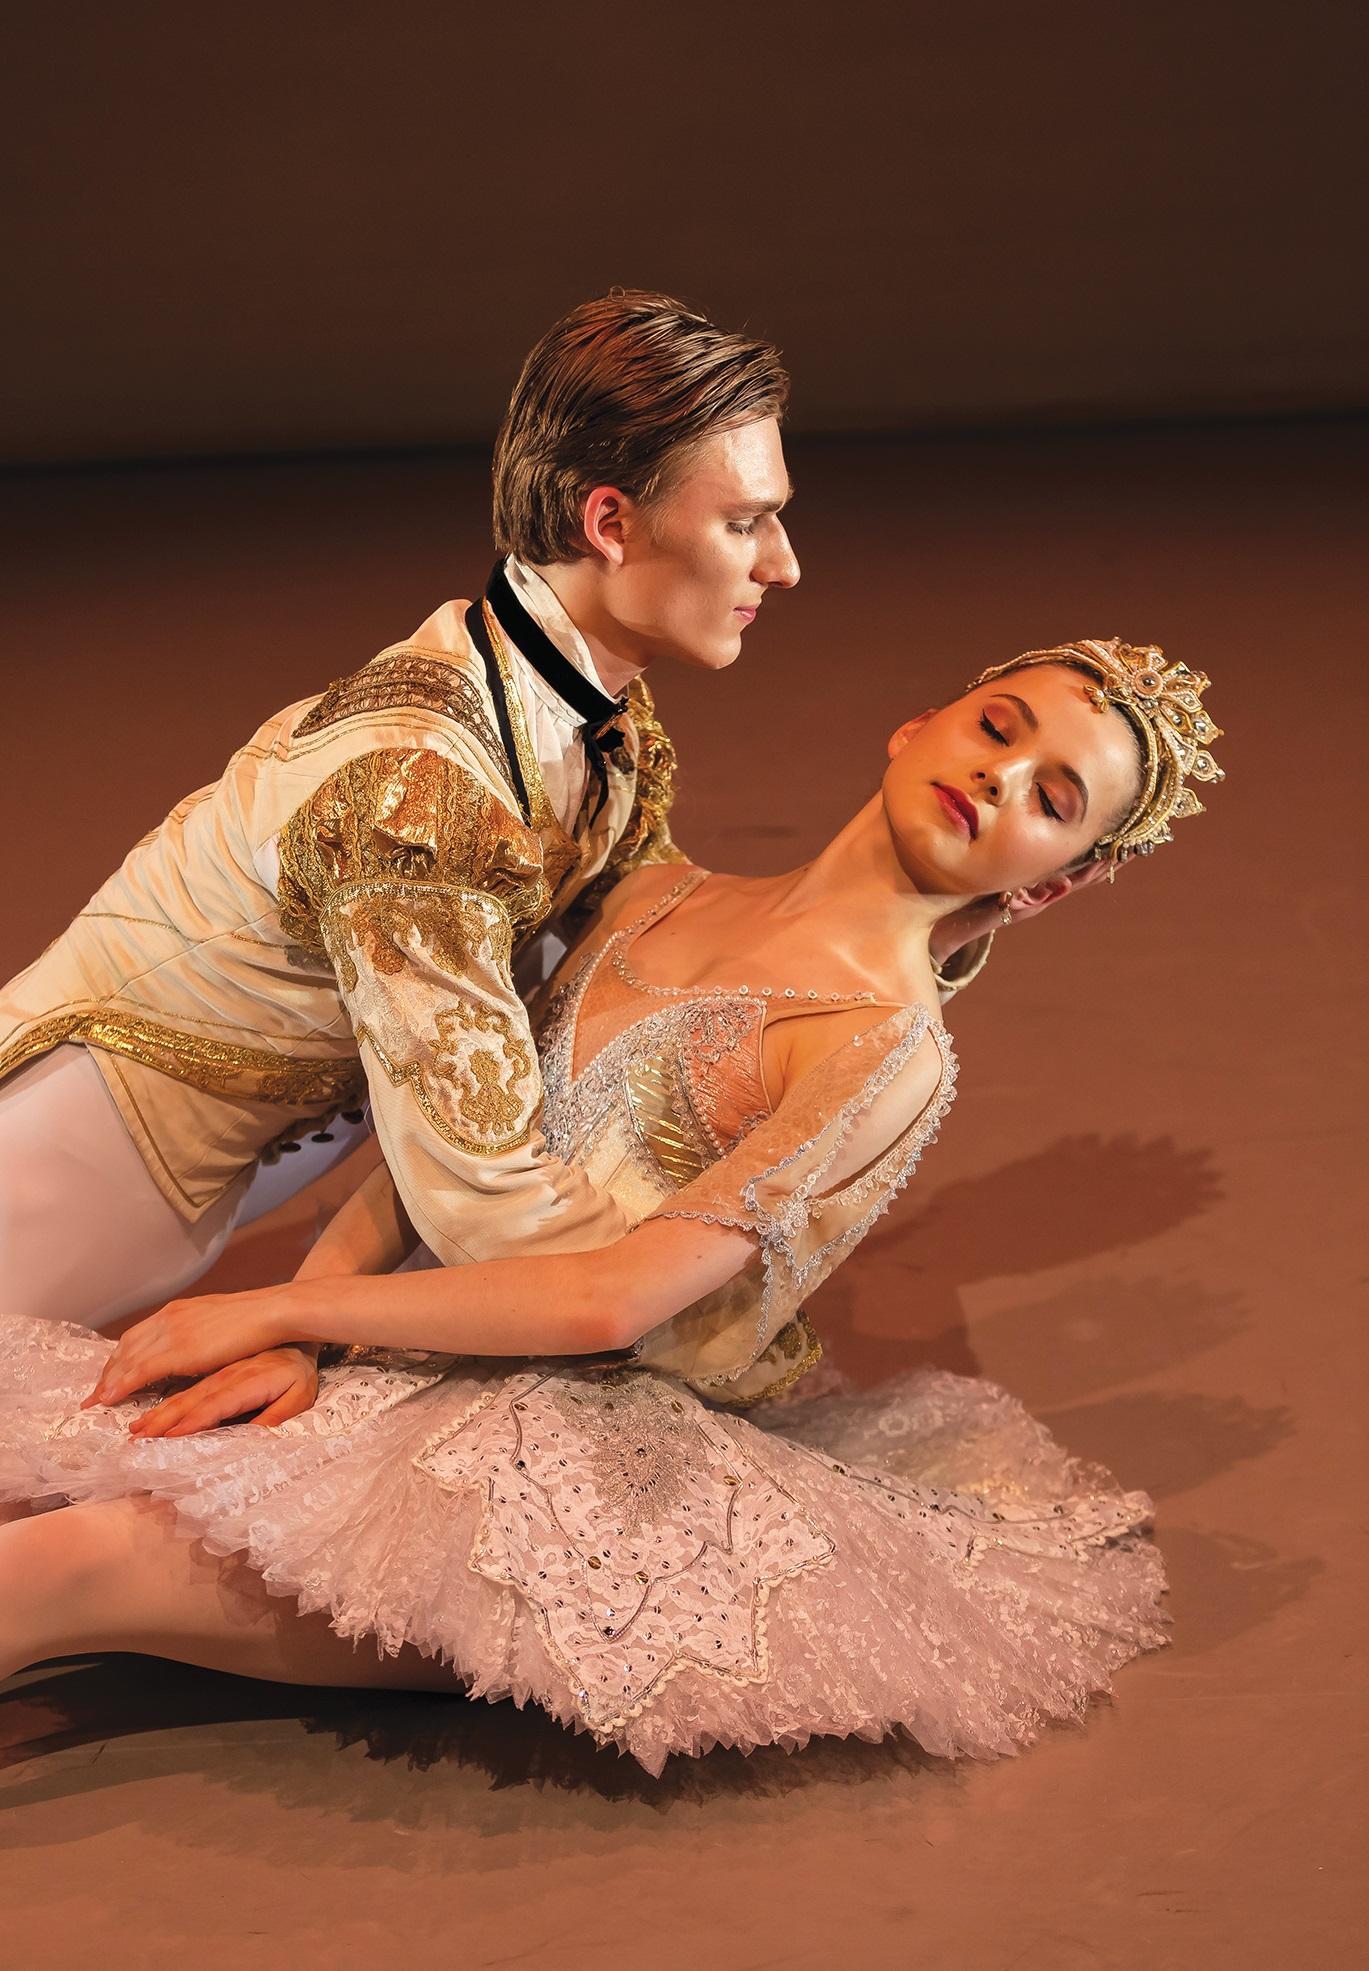 Elmhurst Ballet School - Ryan Felix and Francesca Hardwick in 'The Sleepinng Beauty' excerpt. Photography Andreew Ross.jpg